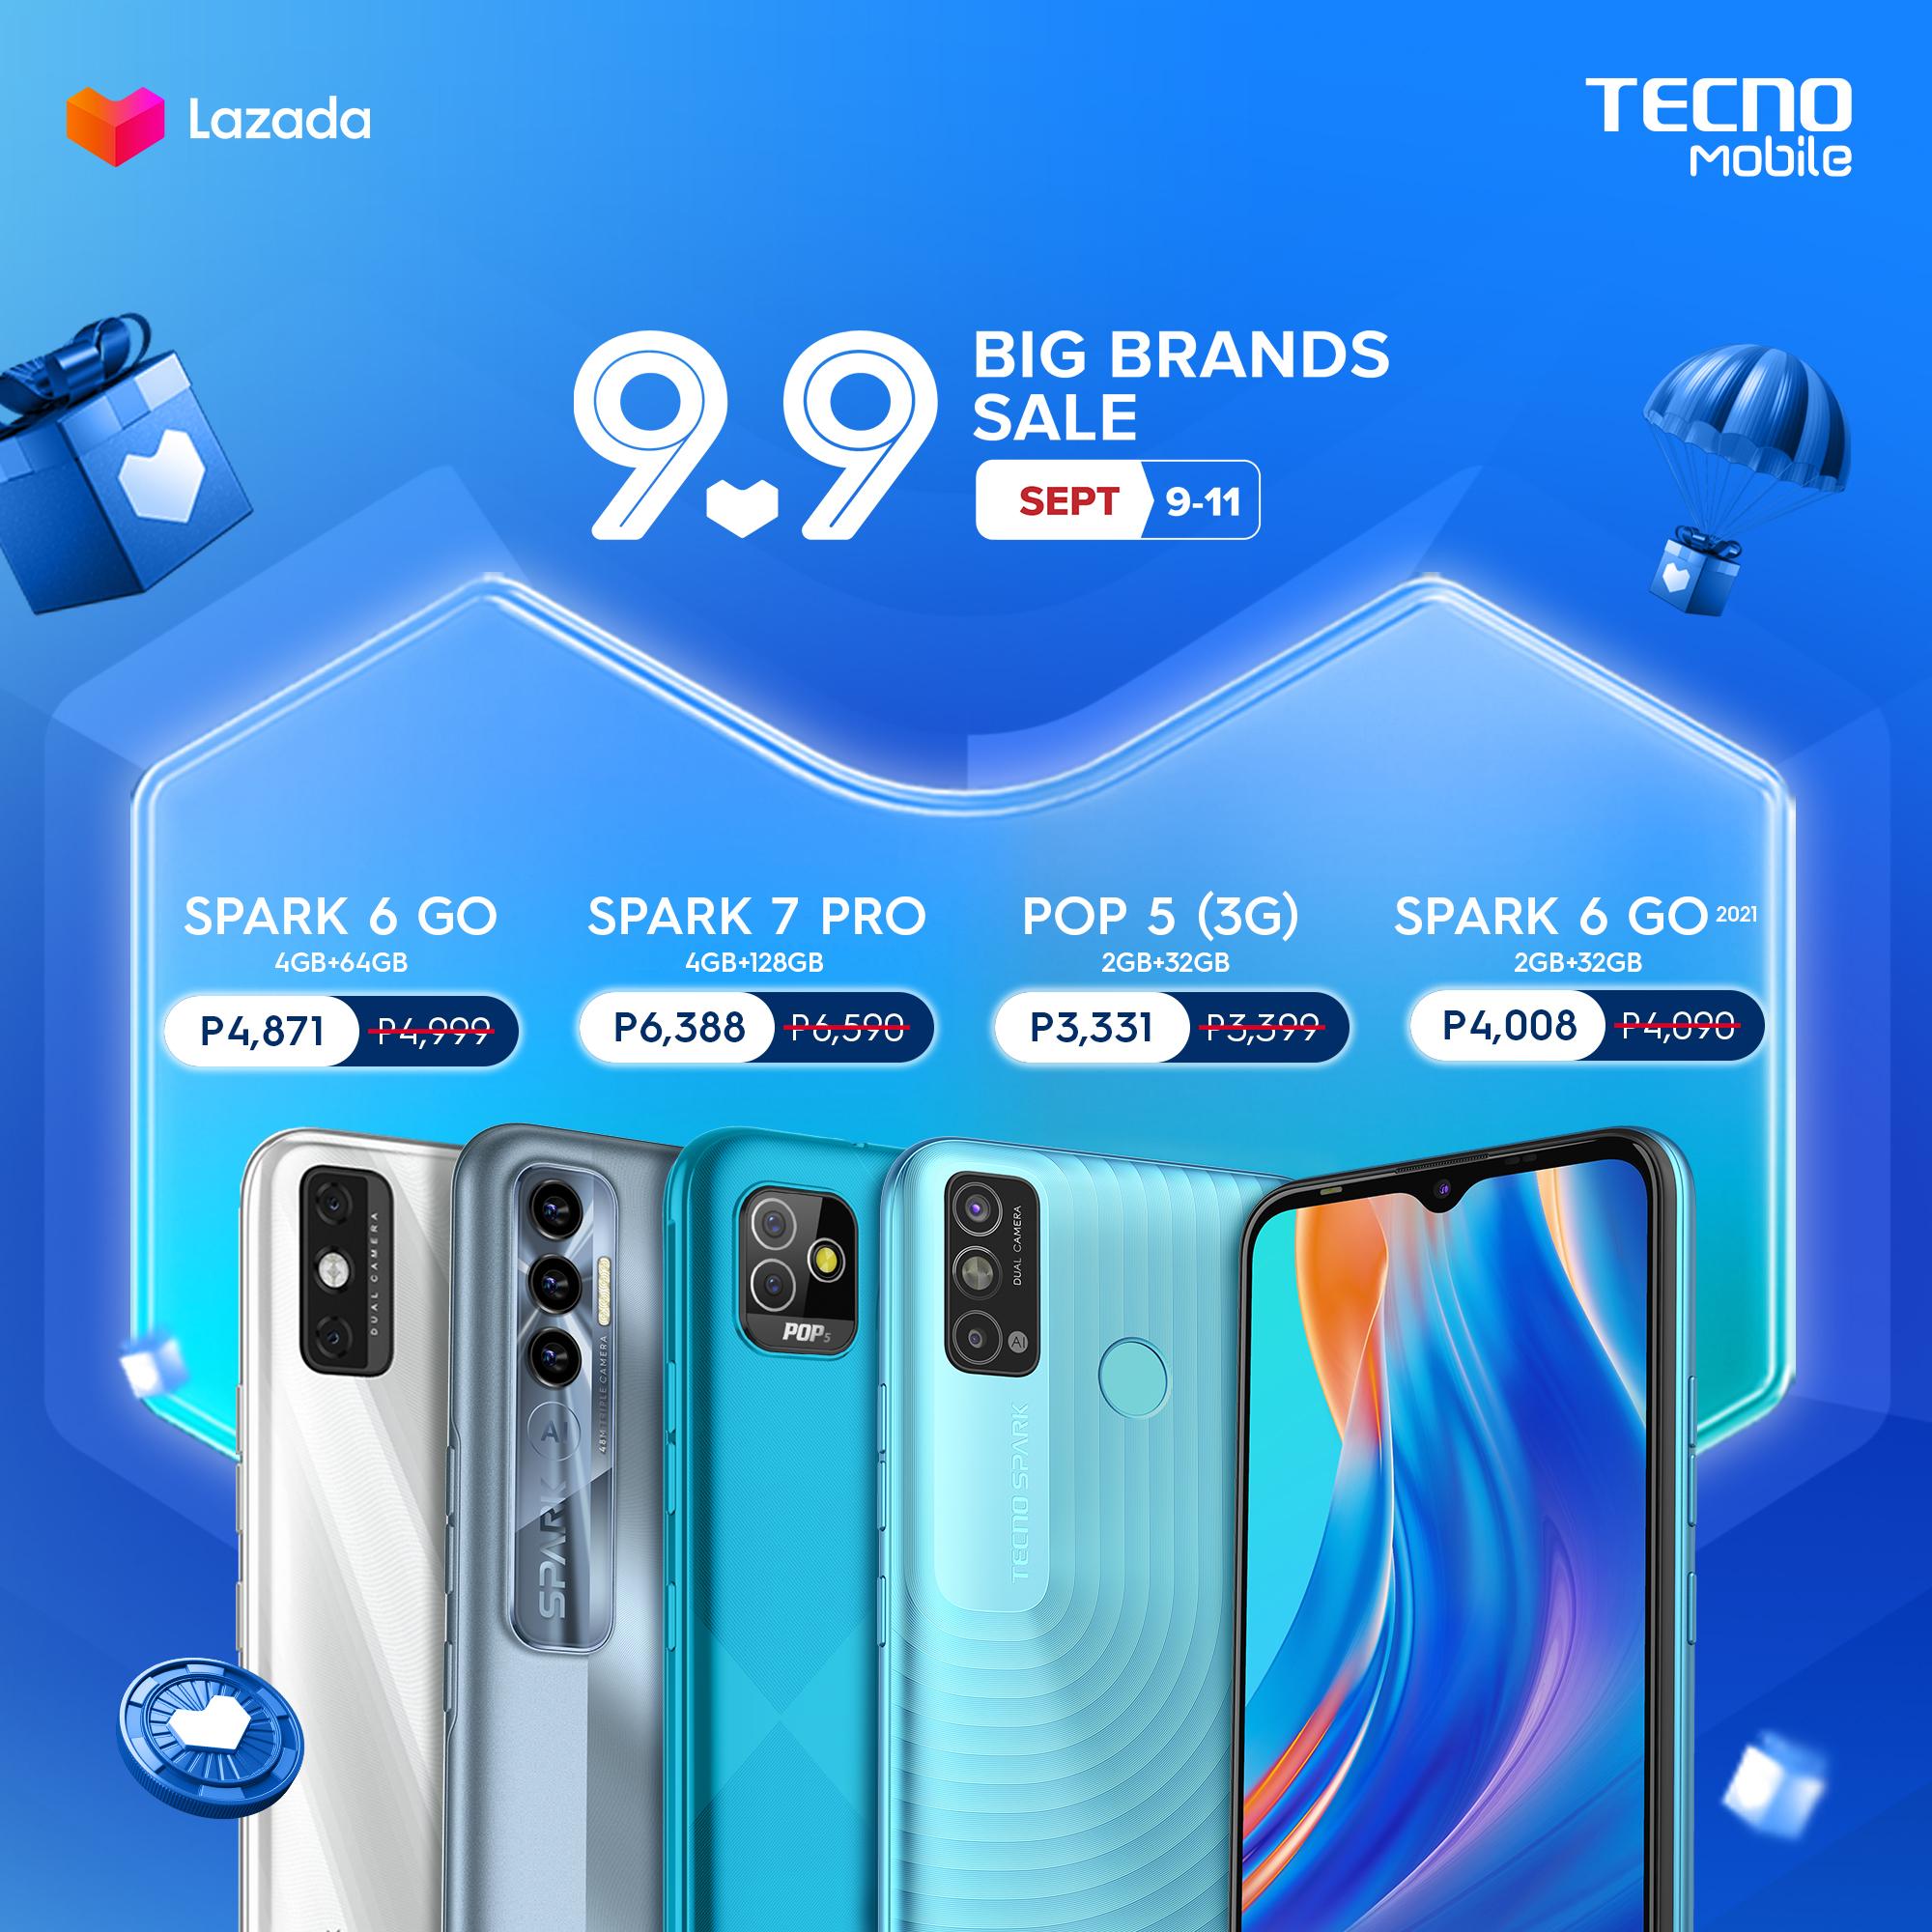 TECNO Mobile Lazada 9.9